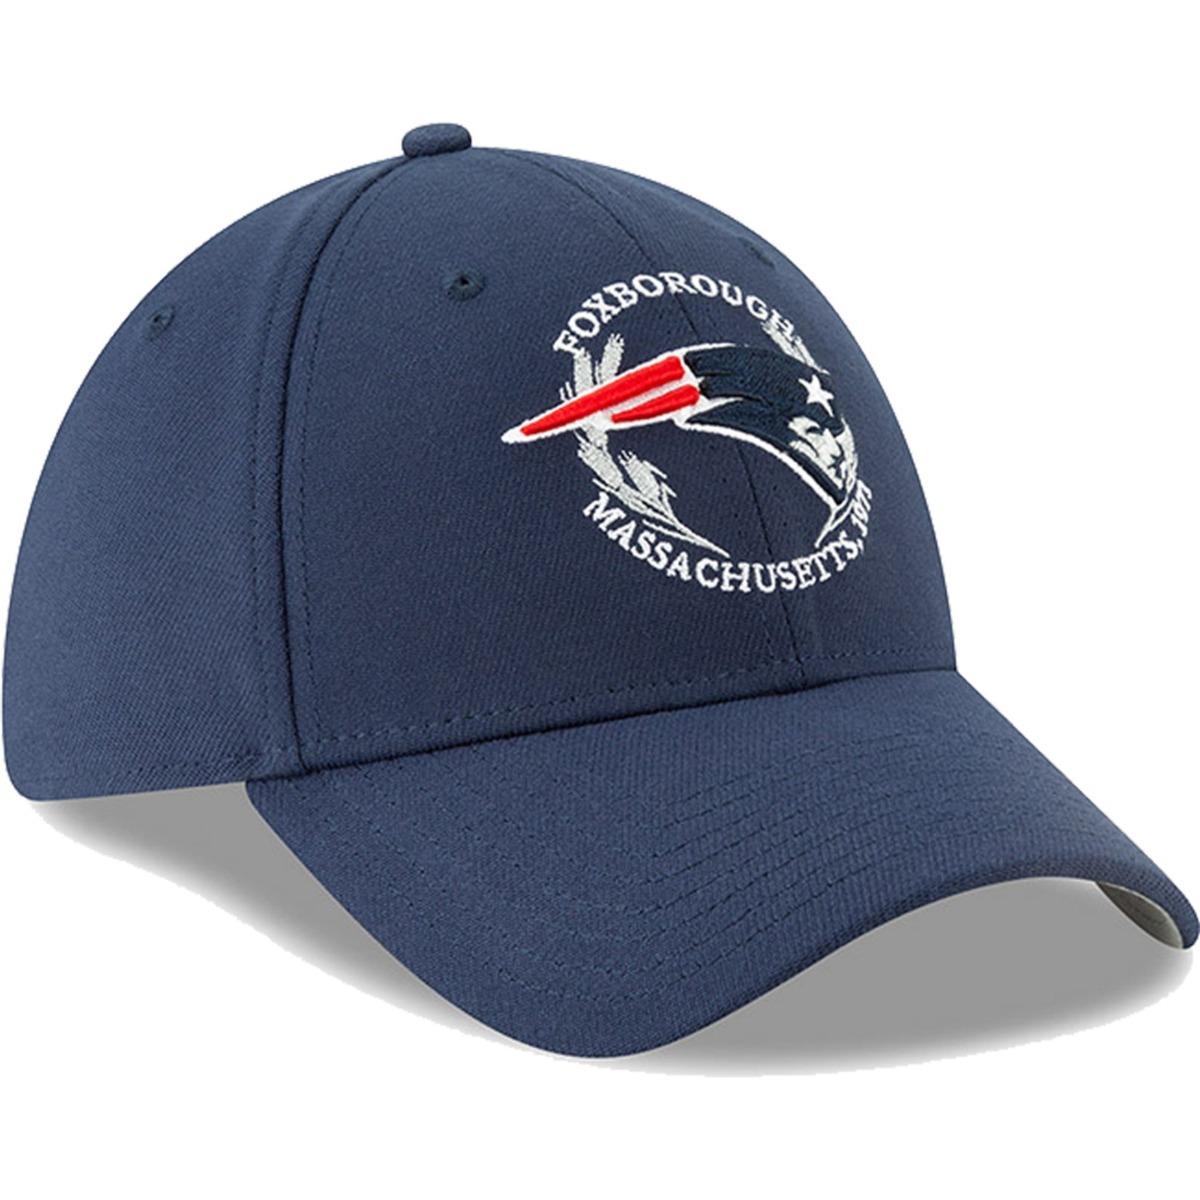 e7d280947054 Gorra New England Patriots New Era 2019 Nfl Draft On-stage